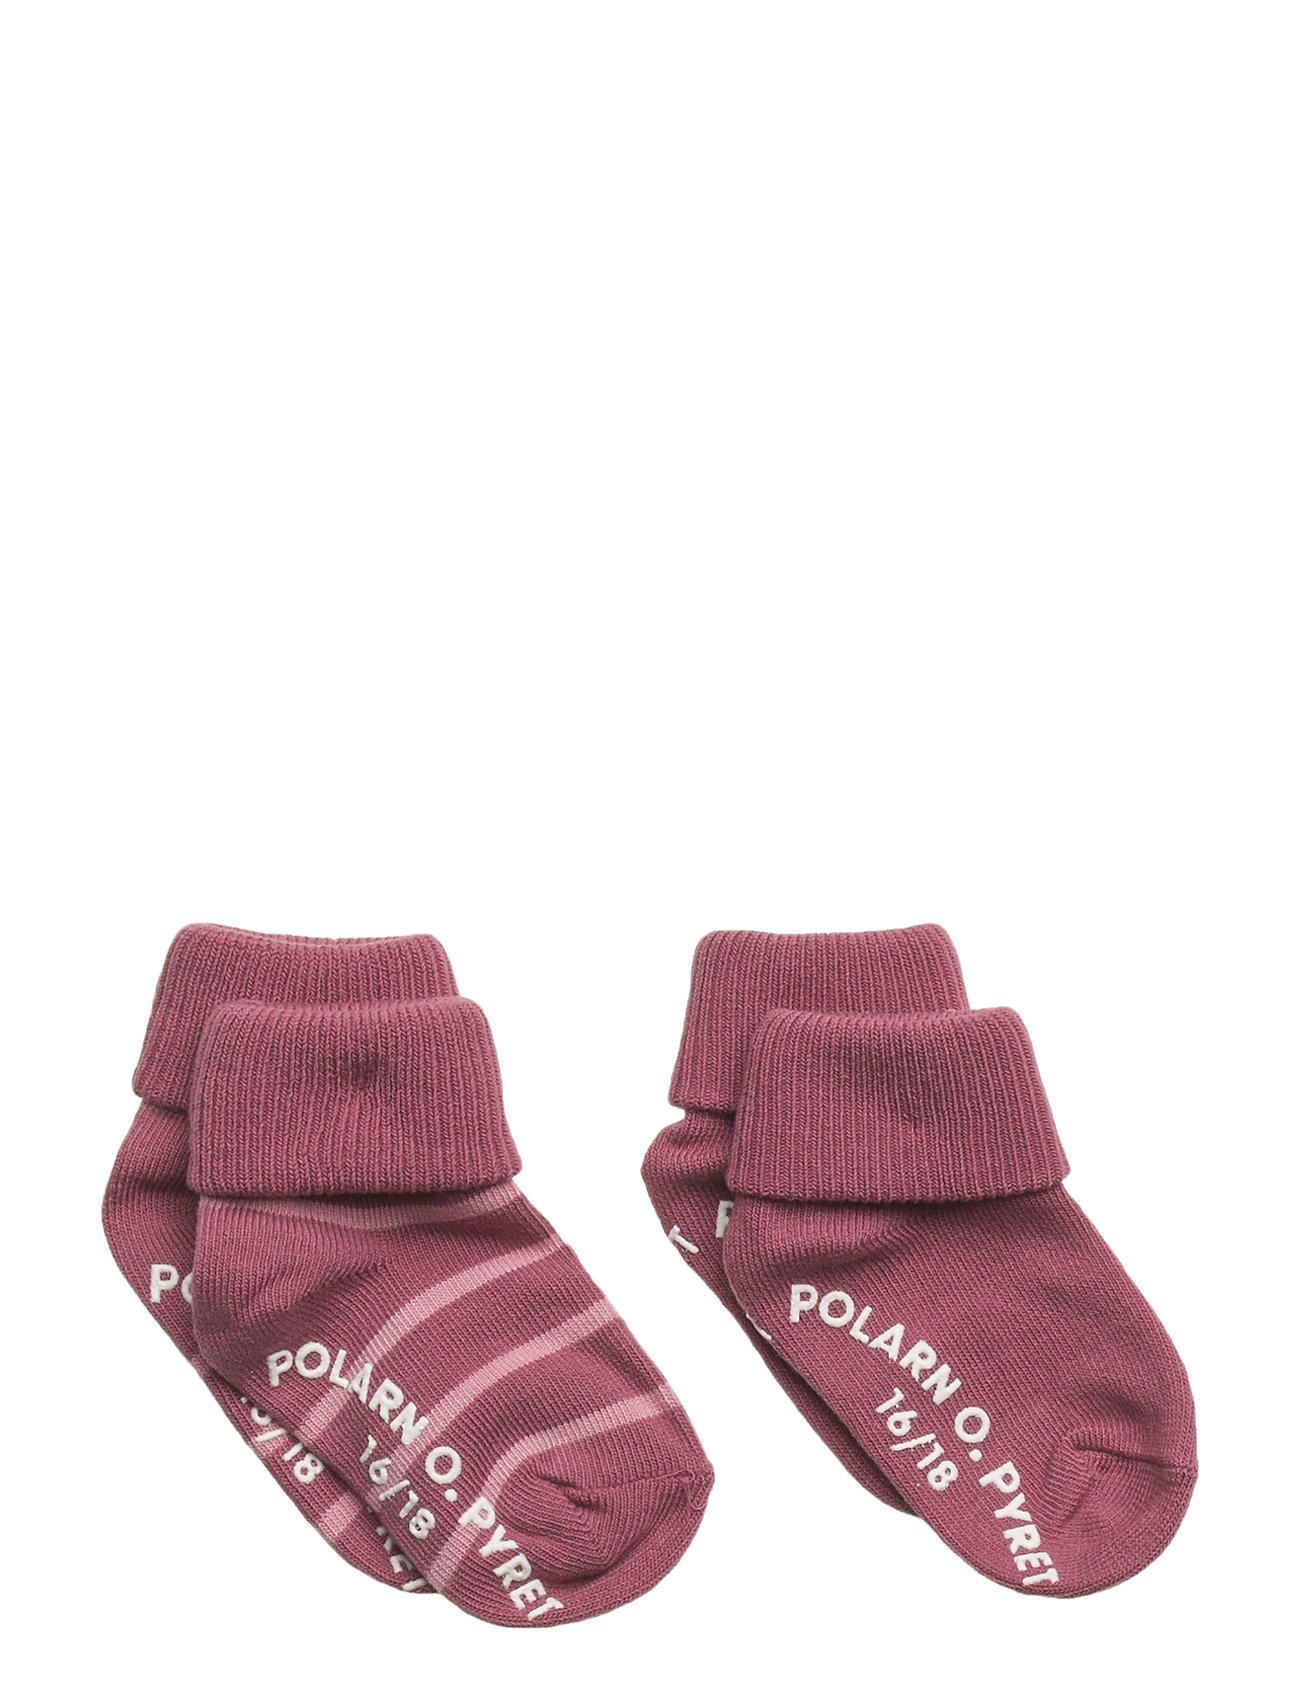 Polarn O. Pyret Sock 2-Pack Striped Turnup